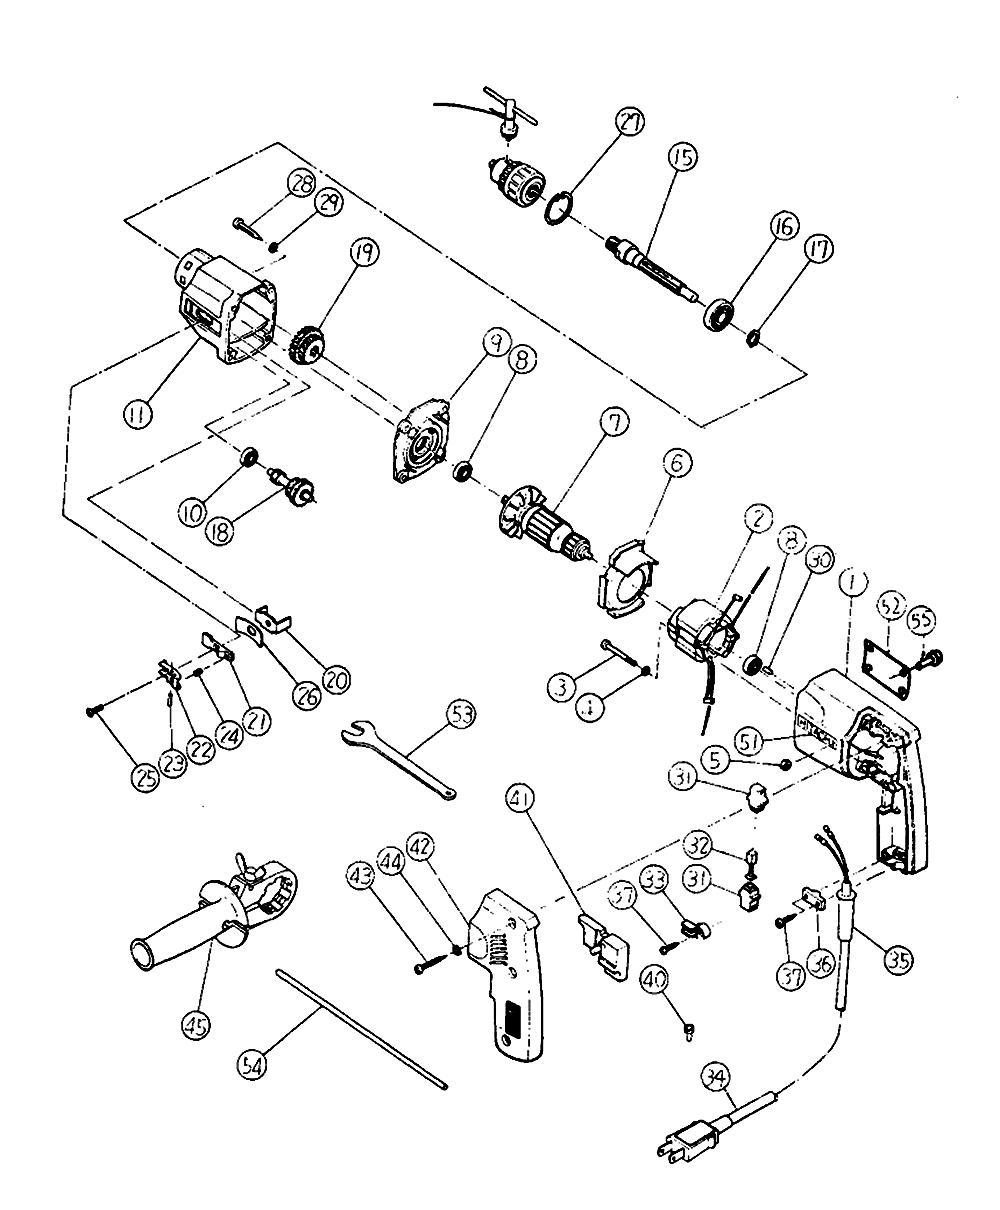 Hitachi DUT13 Parts List | Hitachi DUT13 Repair Parts | OEM